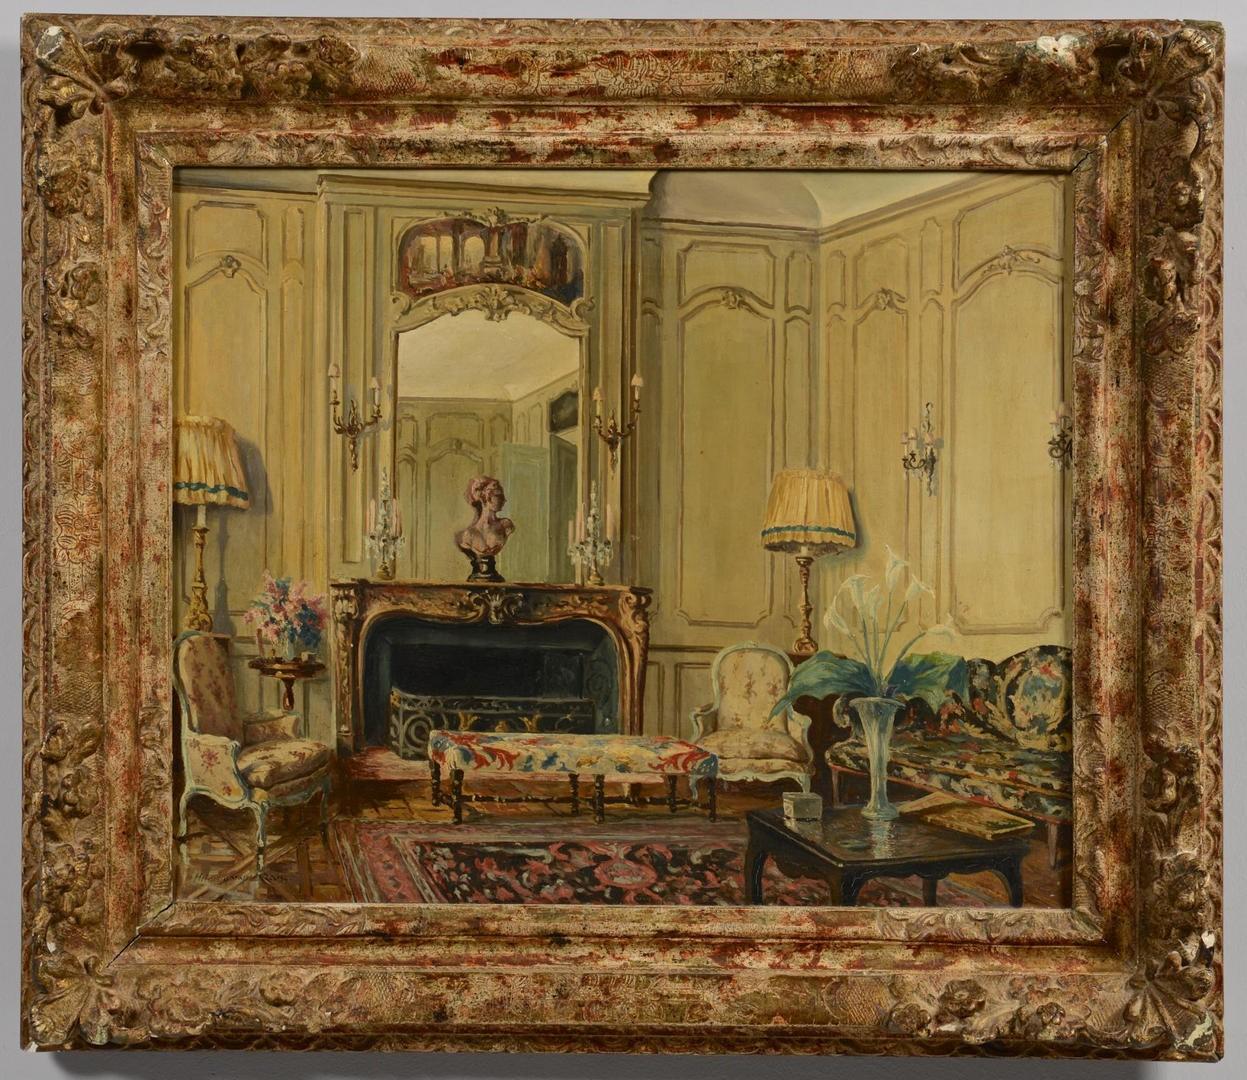 Lot 3594273: Interior Scene, sgd. Heinrich XXXIII Reuss